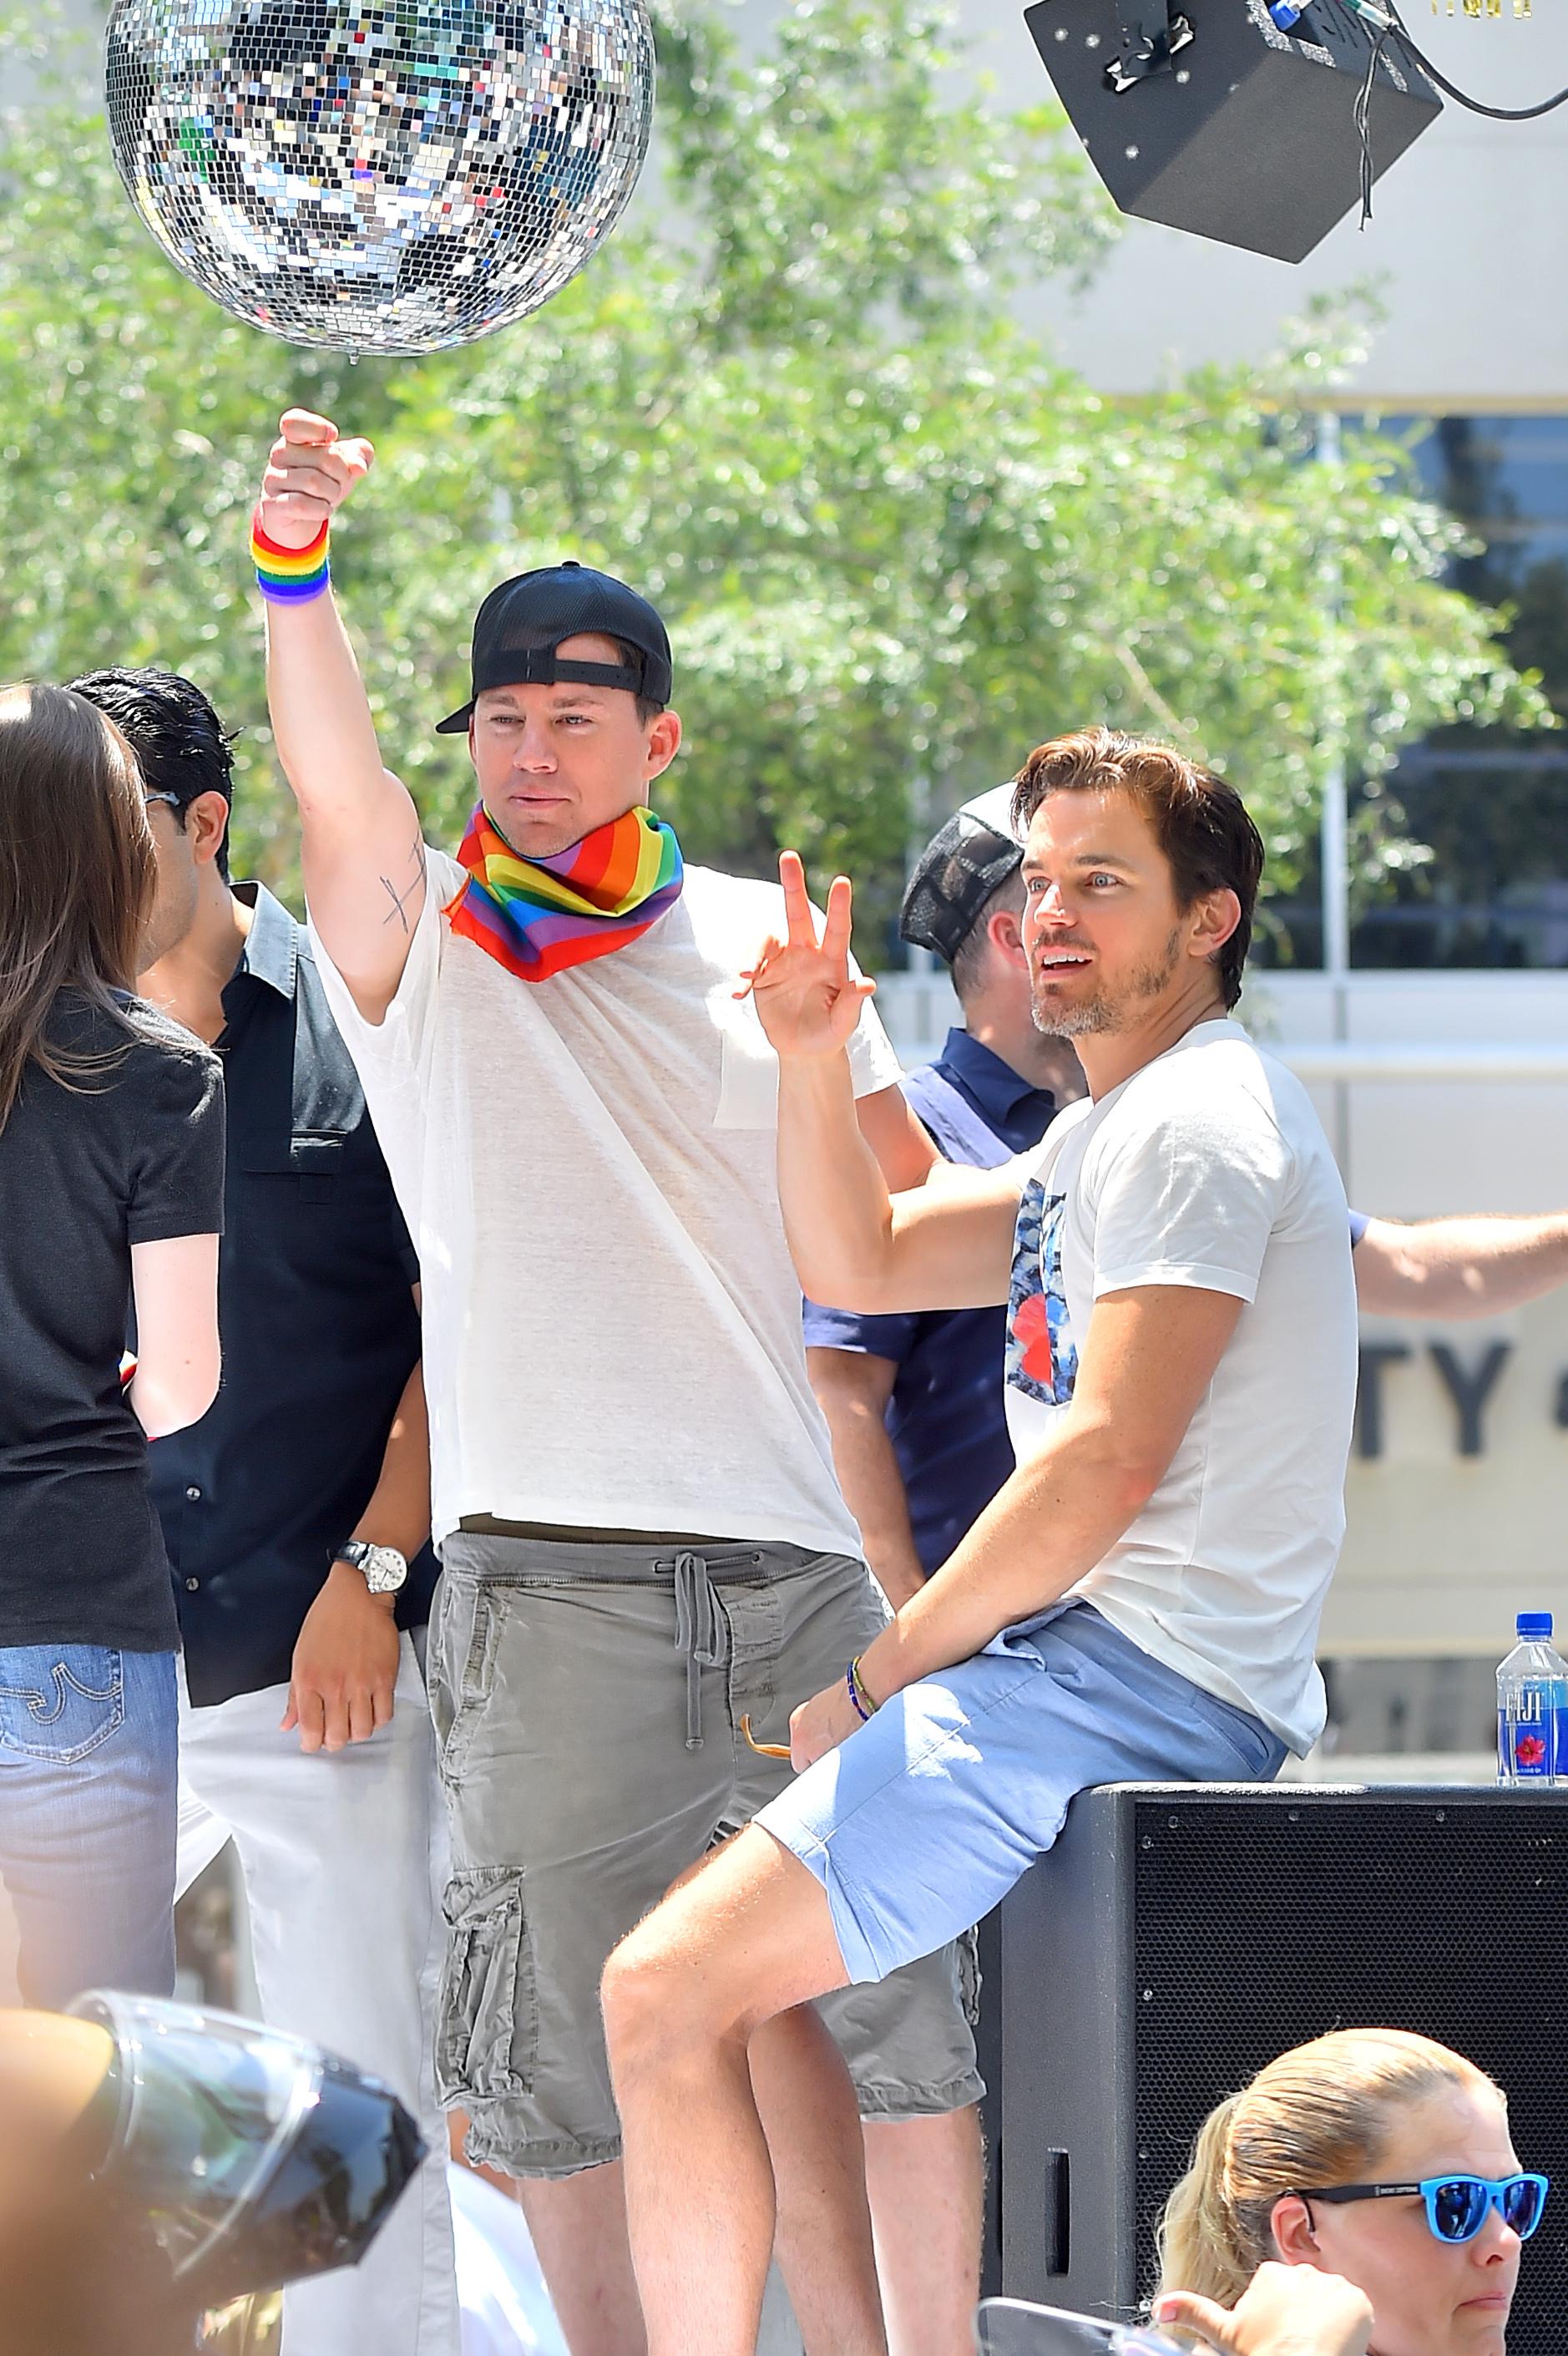 Channing Tatum makes Matt Bomer blush